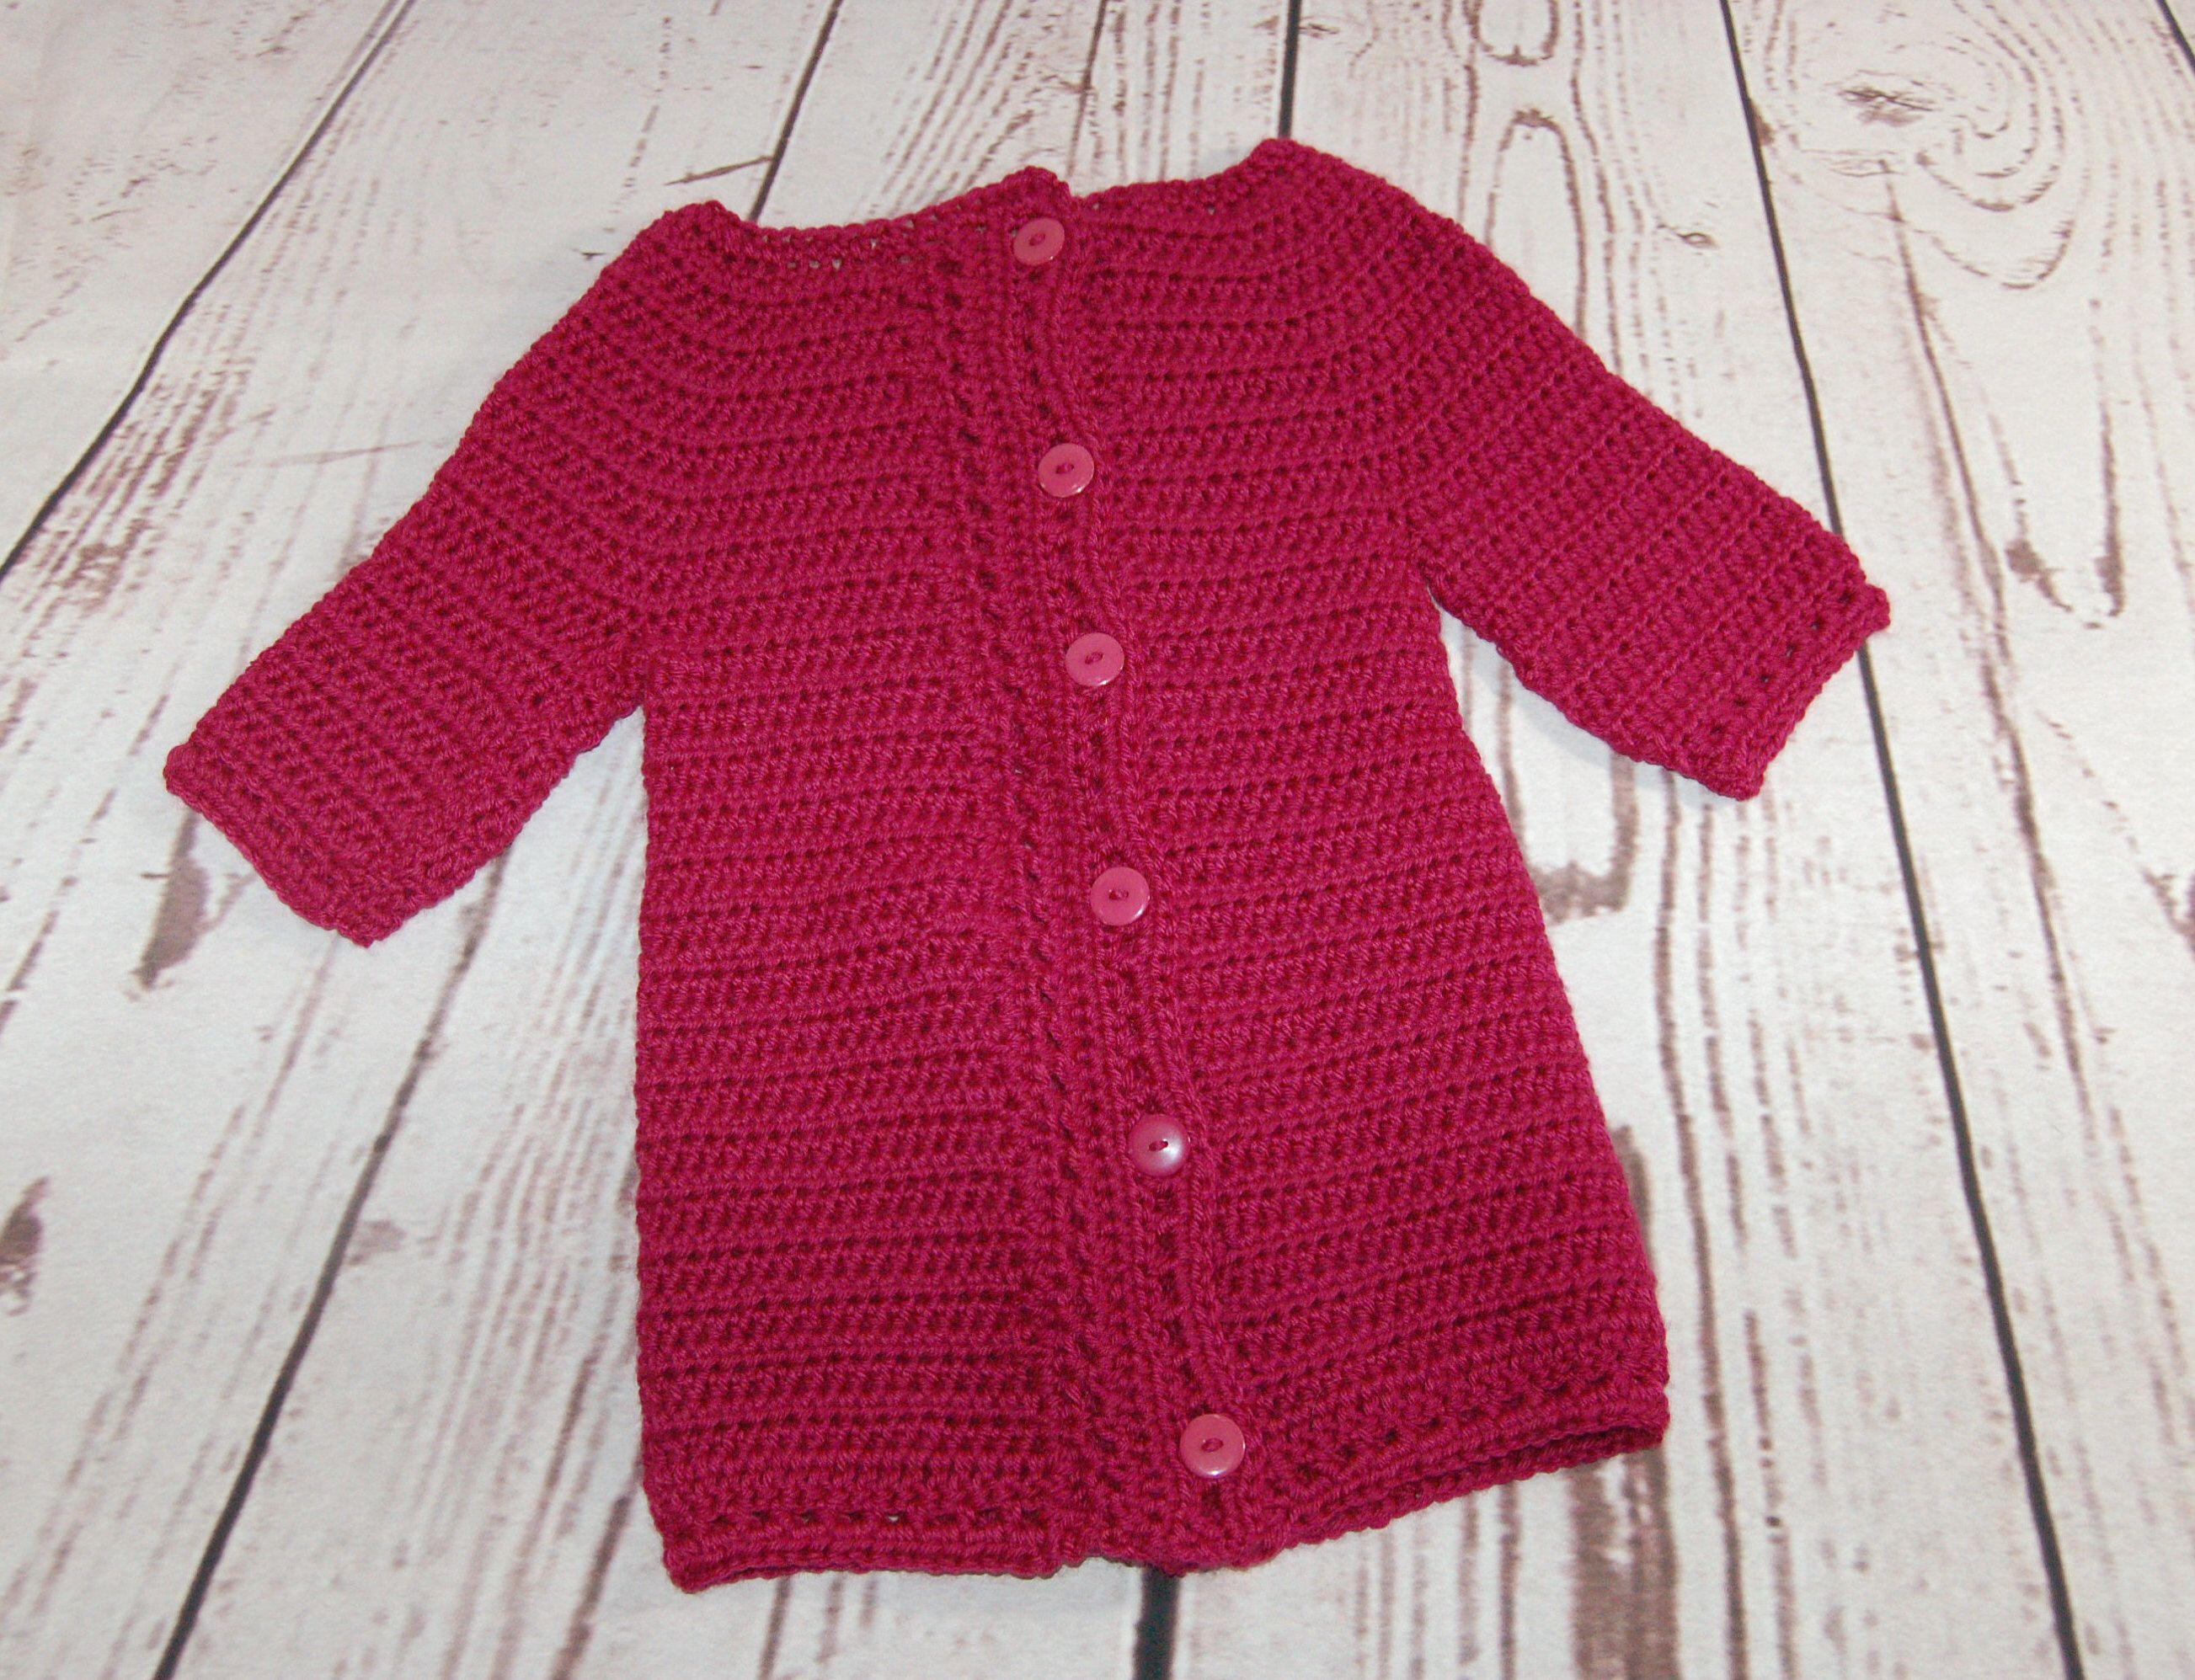 Red Sweater - Childs Sweater - Crochet Sweater - Crochet Cardigan ...